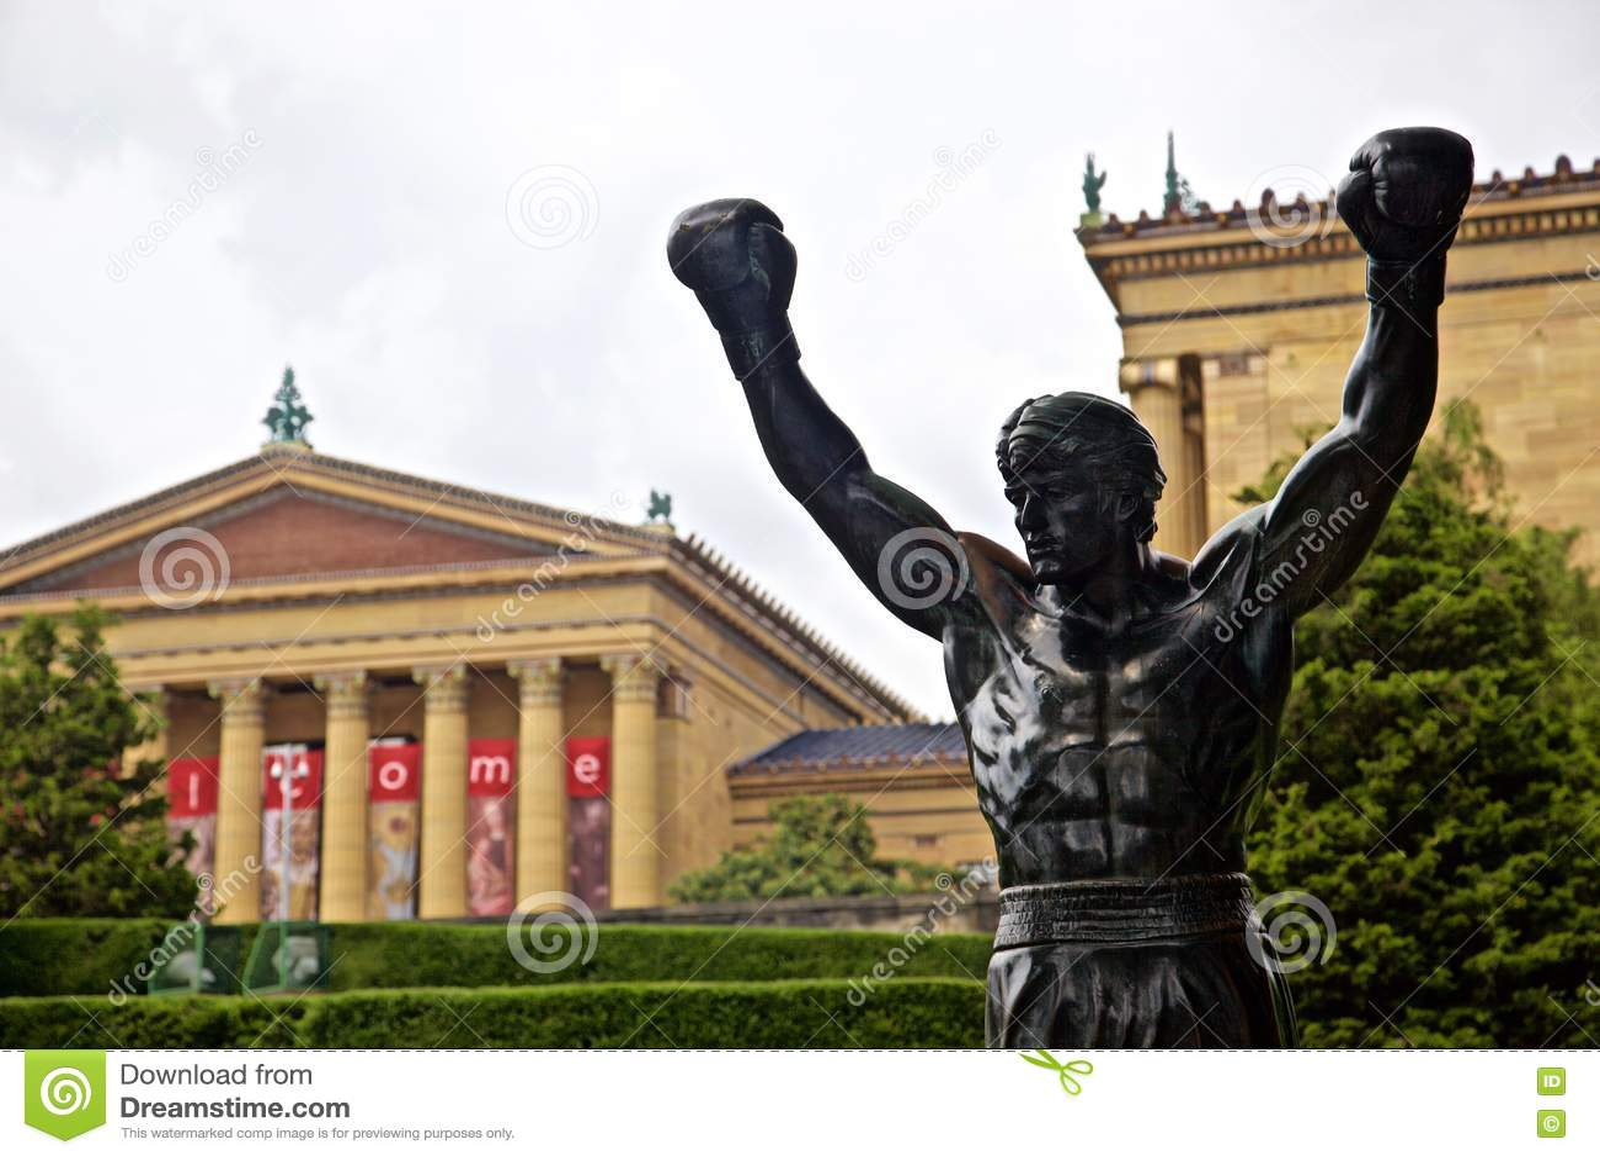 Stenig balboastaty på konstmuseet philadelphia